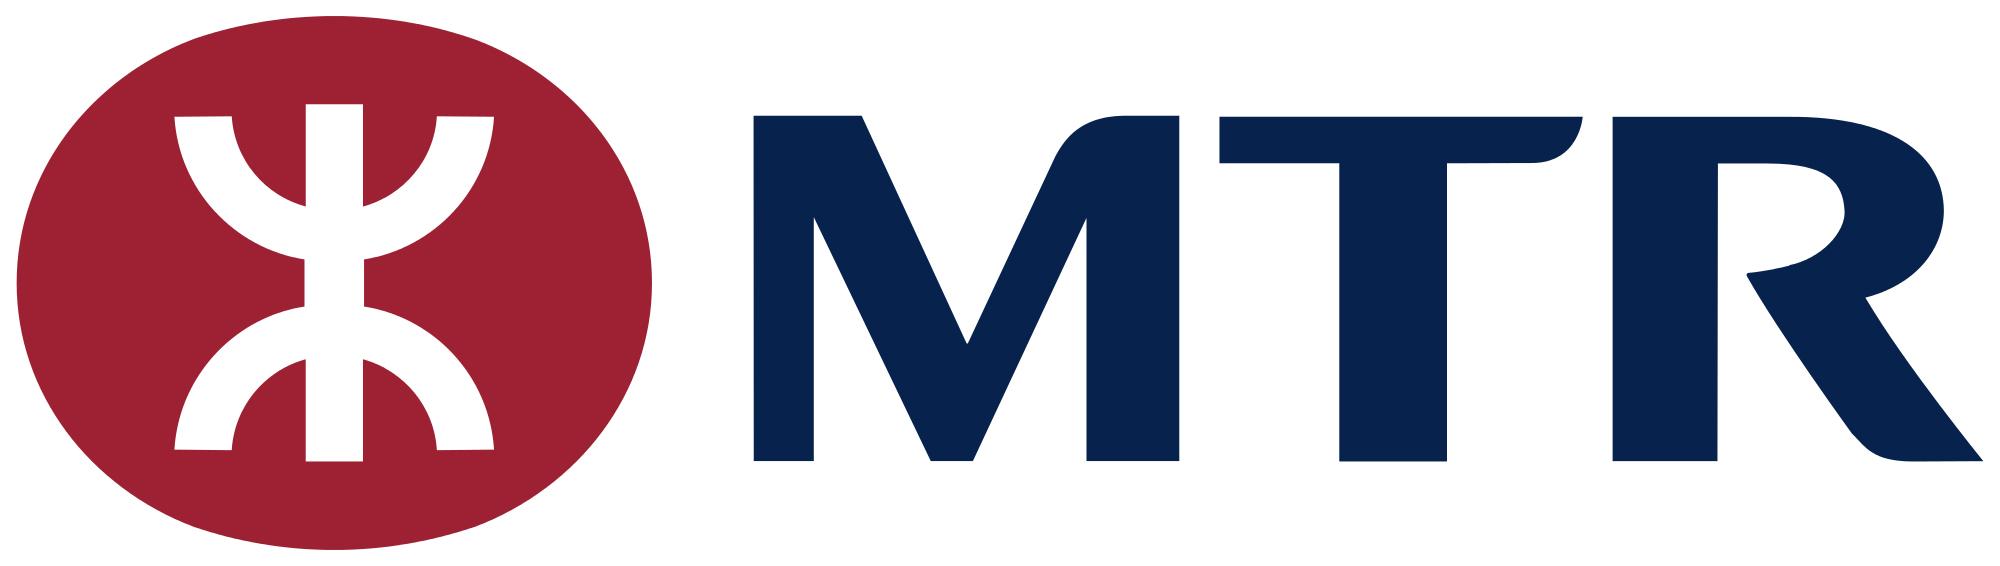 mtr logo copy